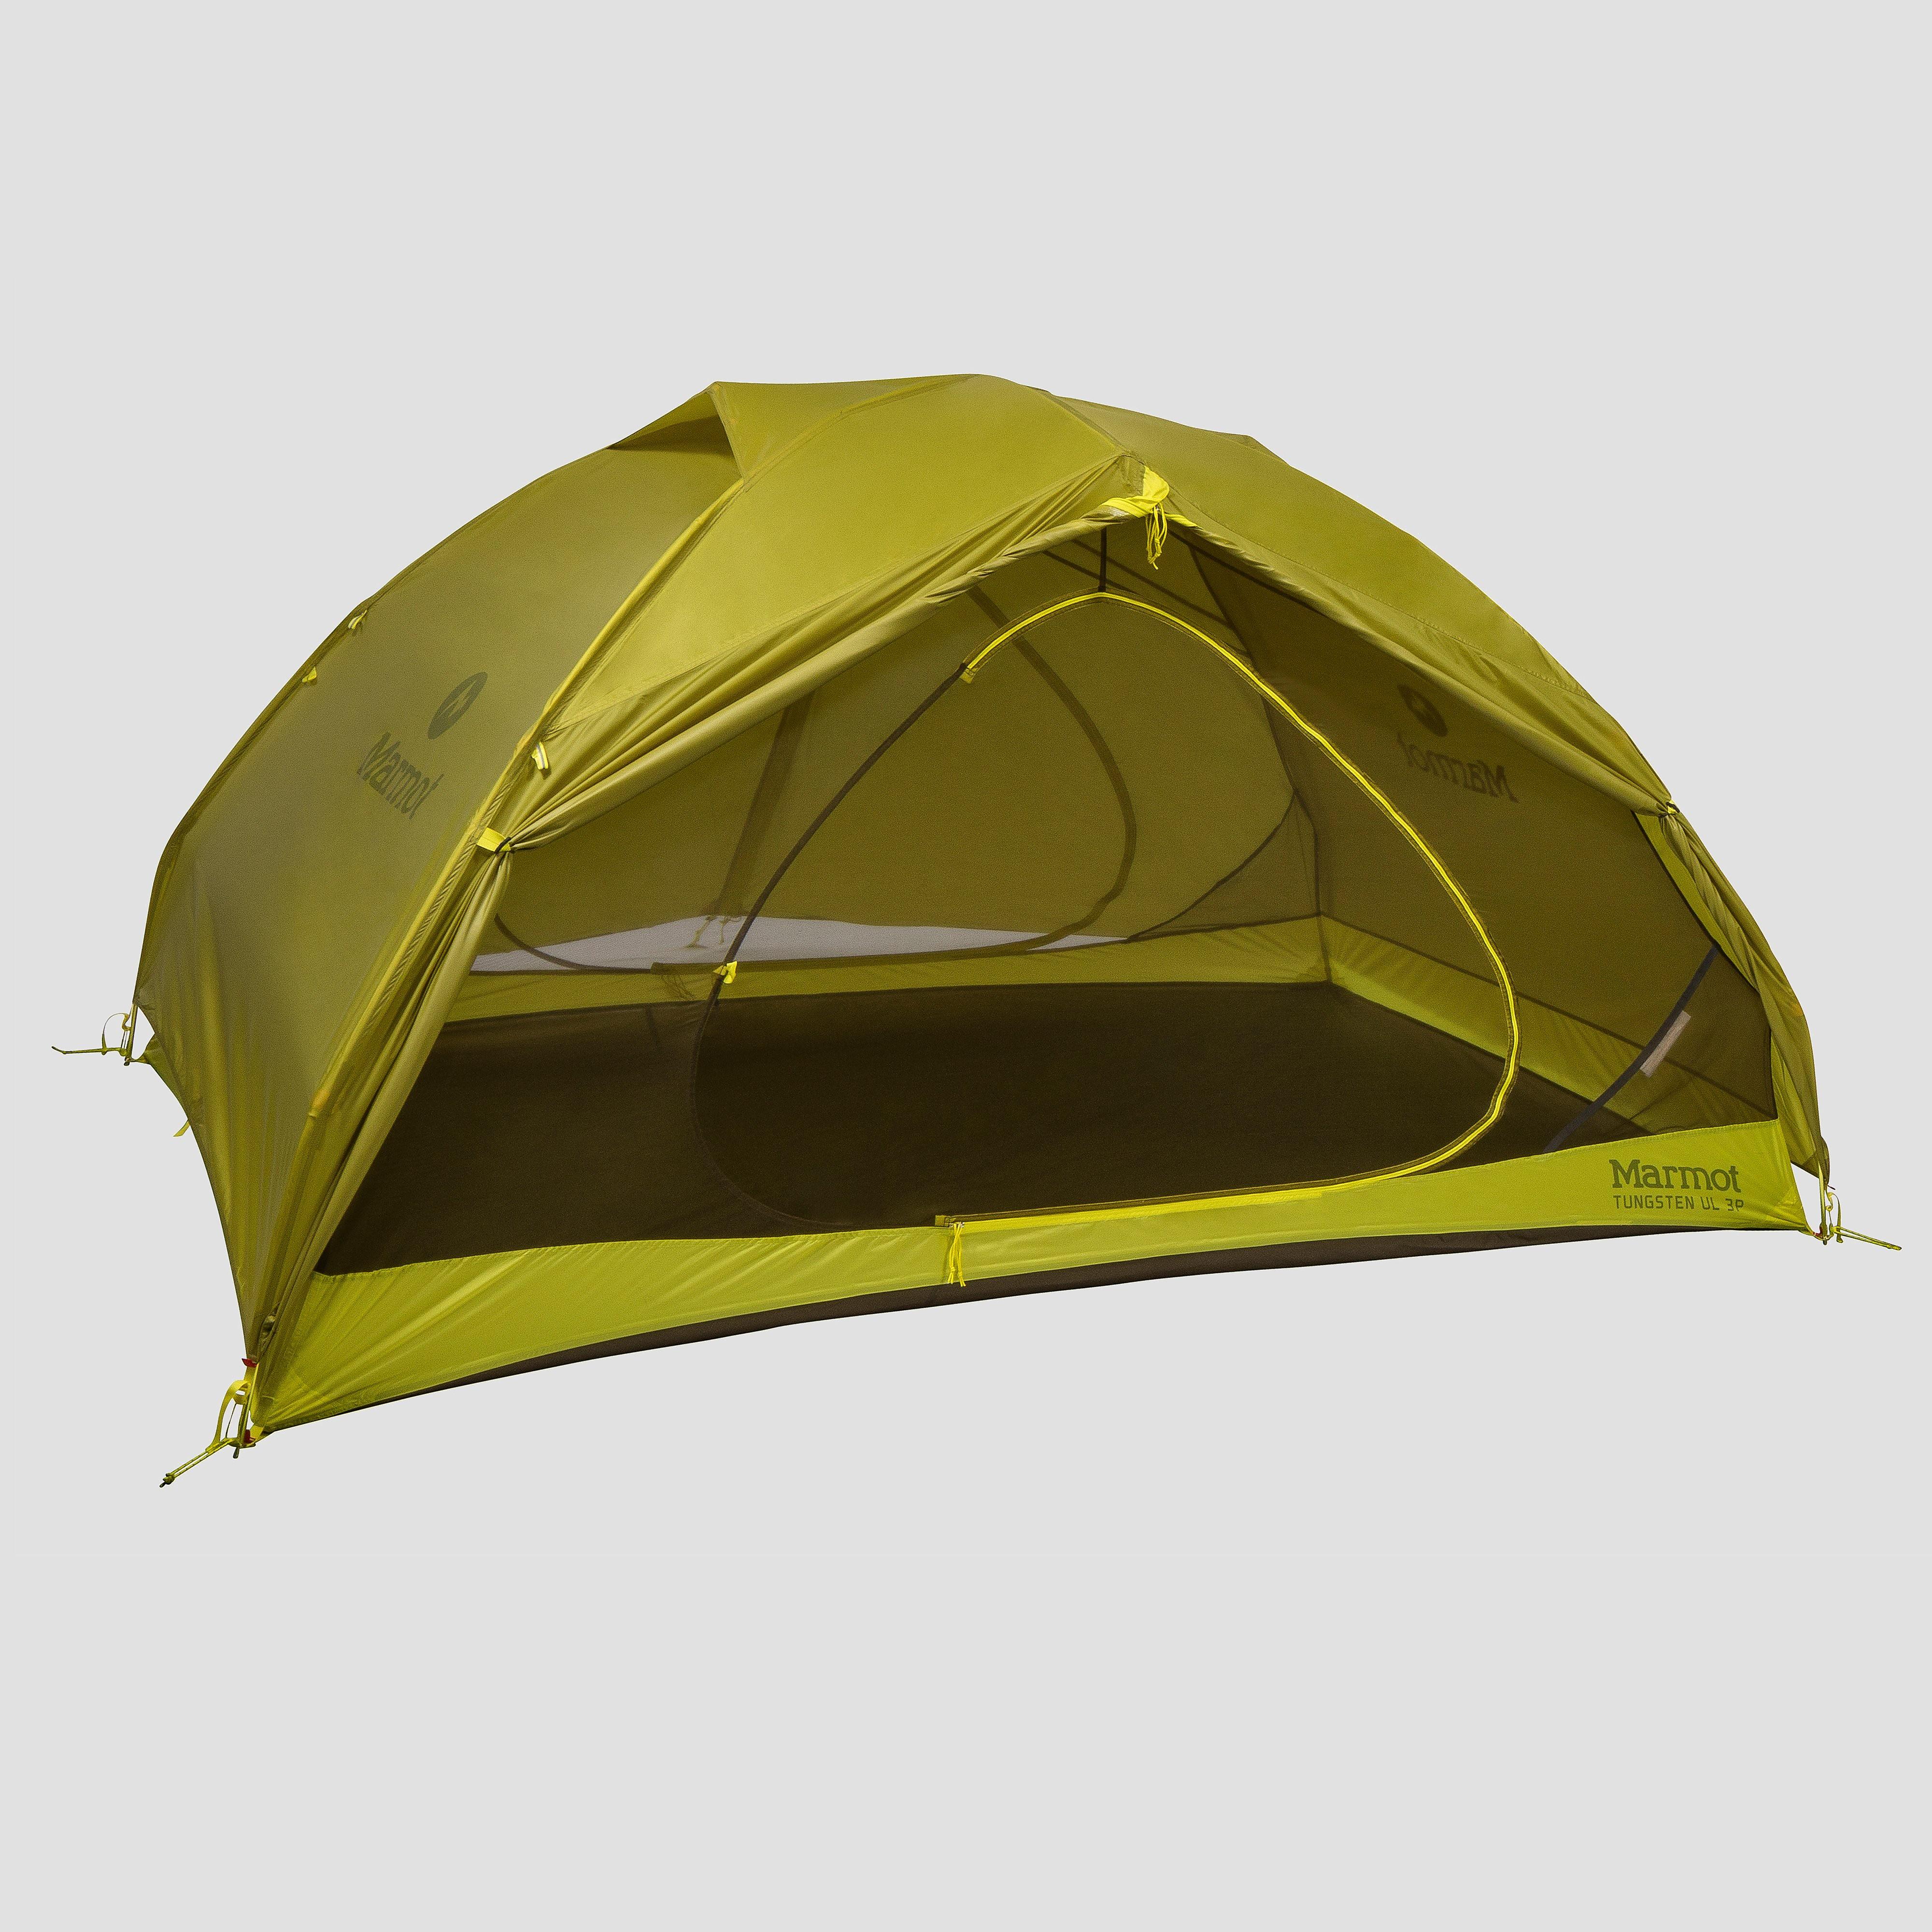 Marmot Tungsten 3 Man Tent